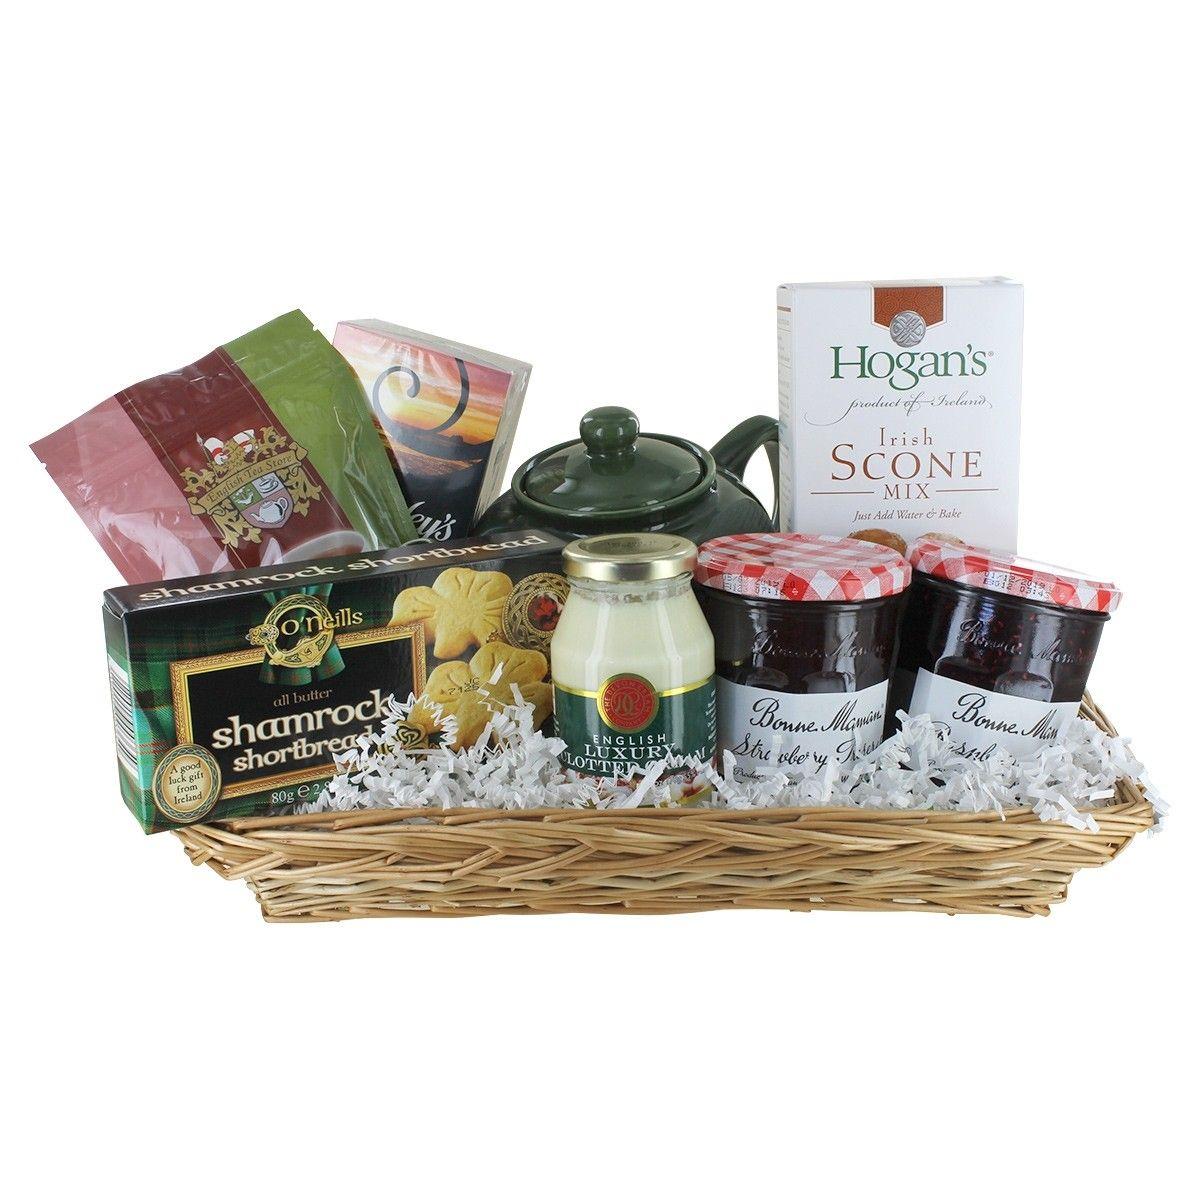 Irish Tea Gift Basket Tea Gifts Basket Tea Gift Baskets Tea Gifts